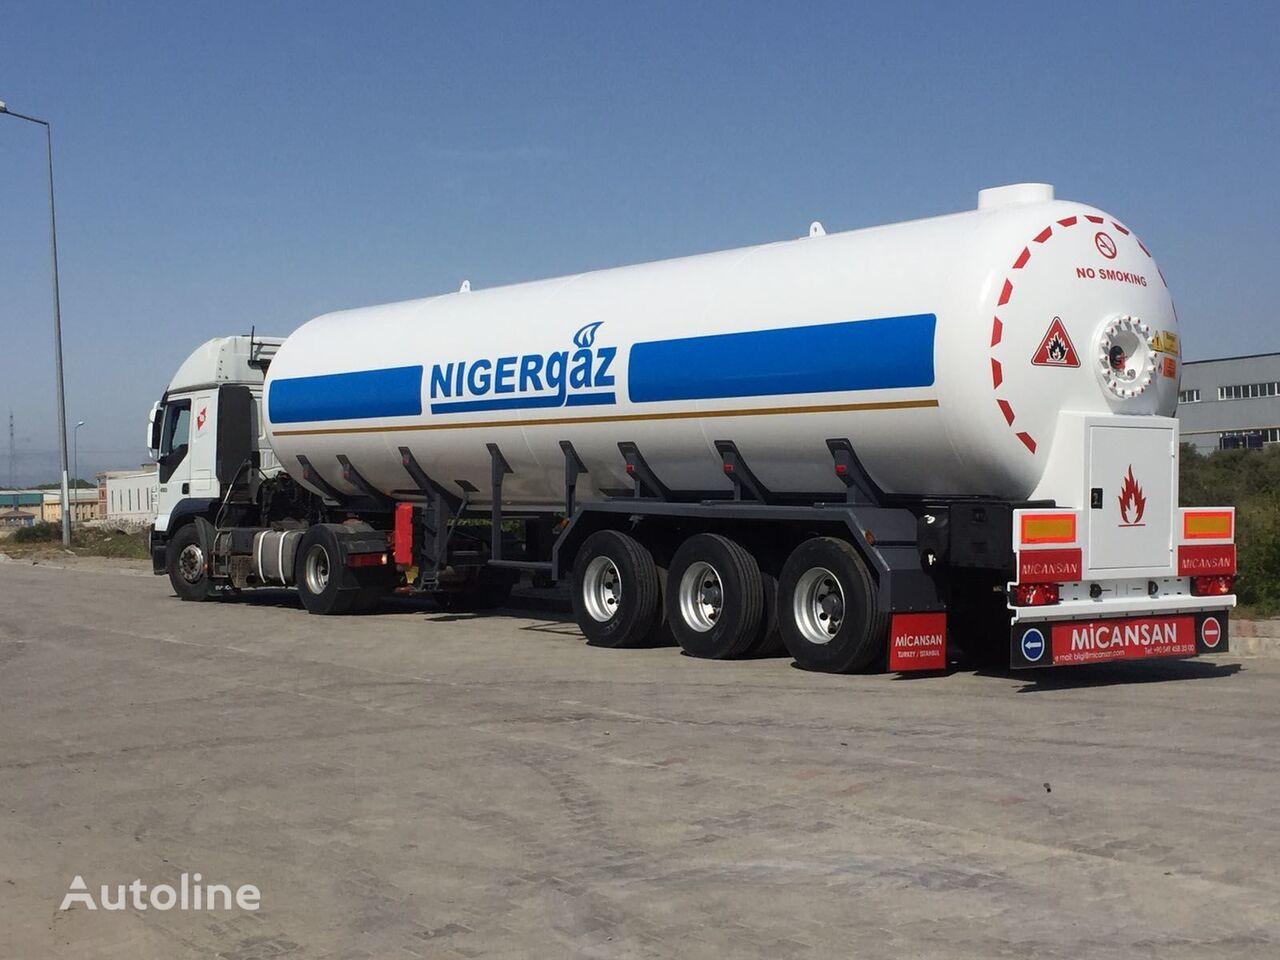 new Micansan 2018 57 M3 2+ 1 AXLES CIF LAGOS / COTONEAU 35.500 EURO gas tank trailer